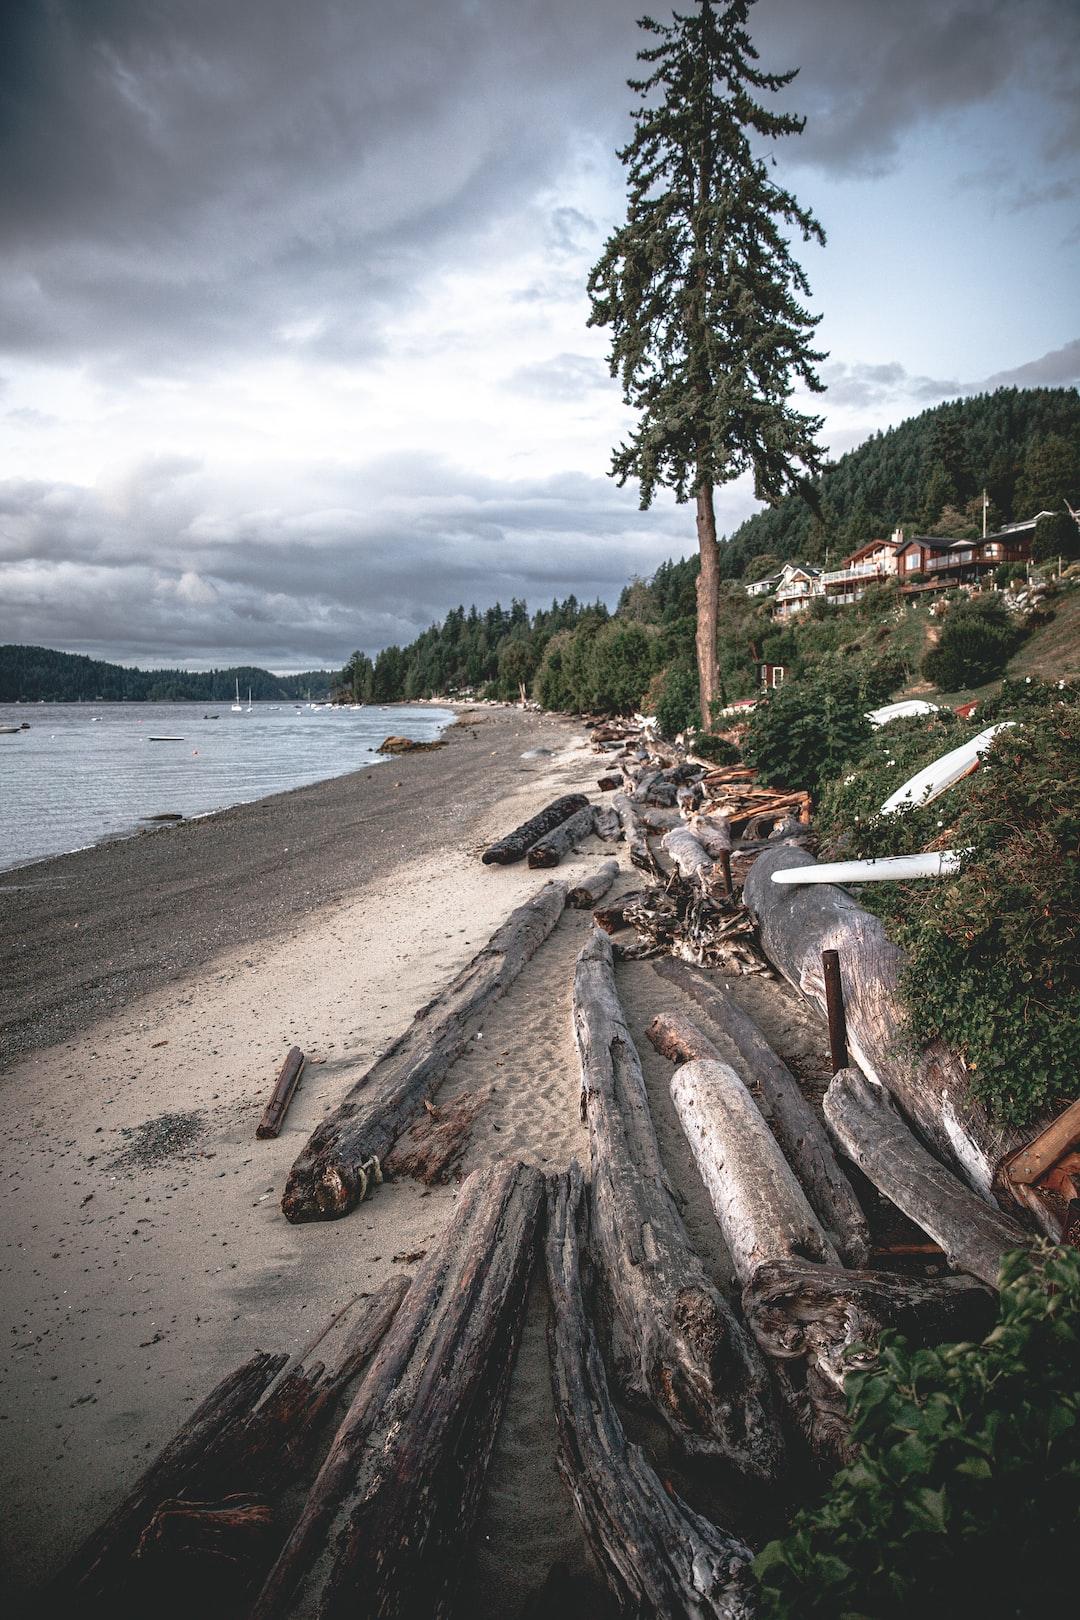 Hopkins Landing on the Sunshine Coast, B.C!  Instagram: @VisualsByRoyalZ